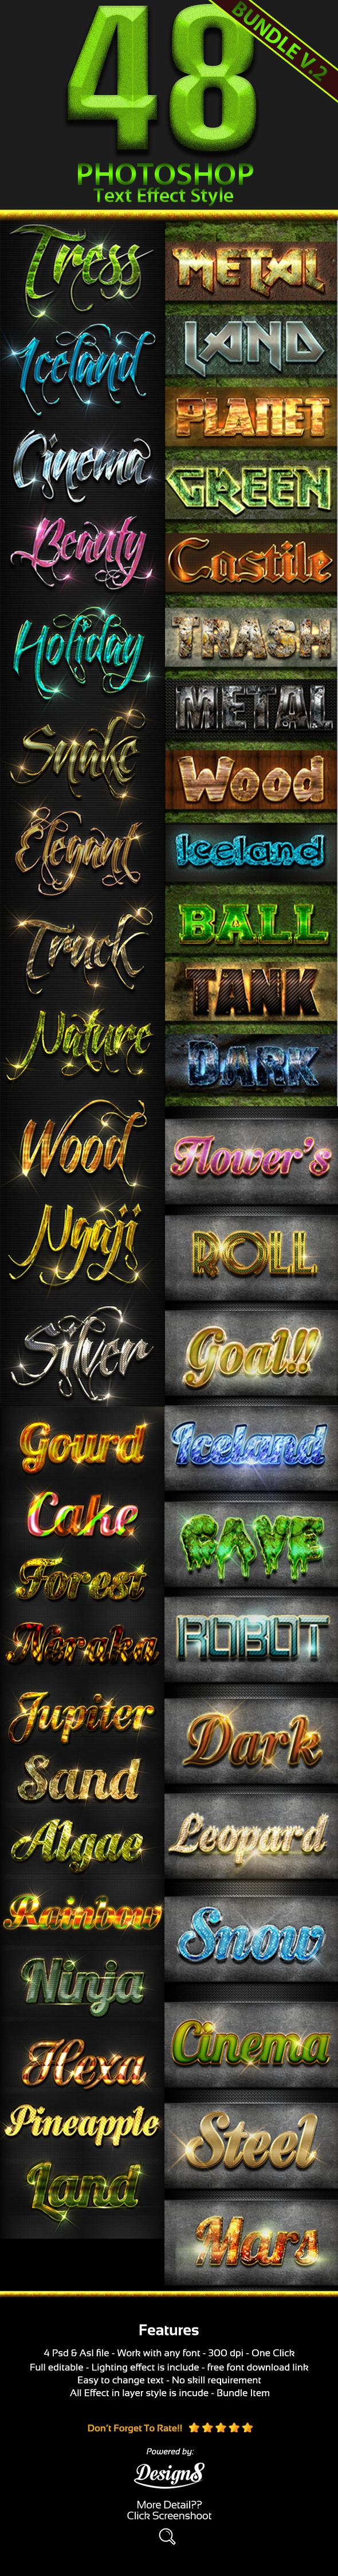 48 Photoshop Text Styles Bundle Part 2 - Text Effects Styles